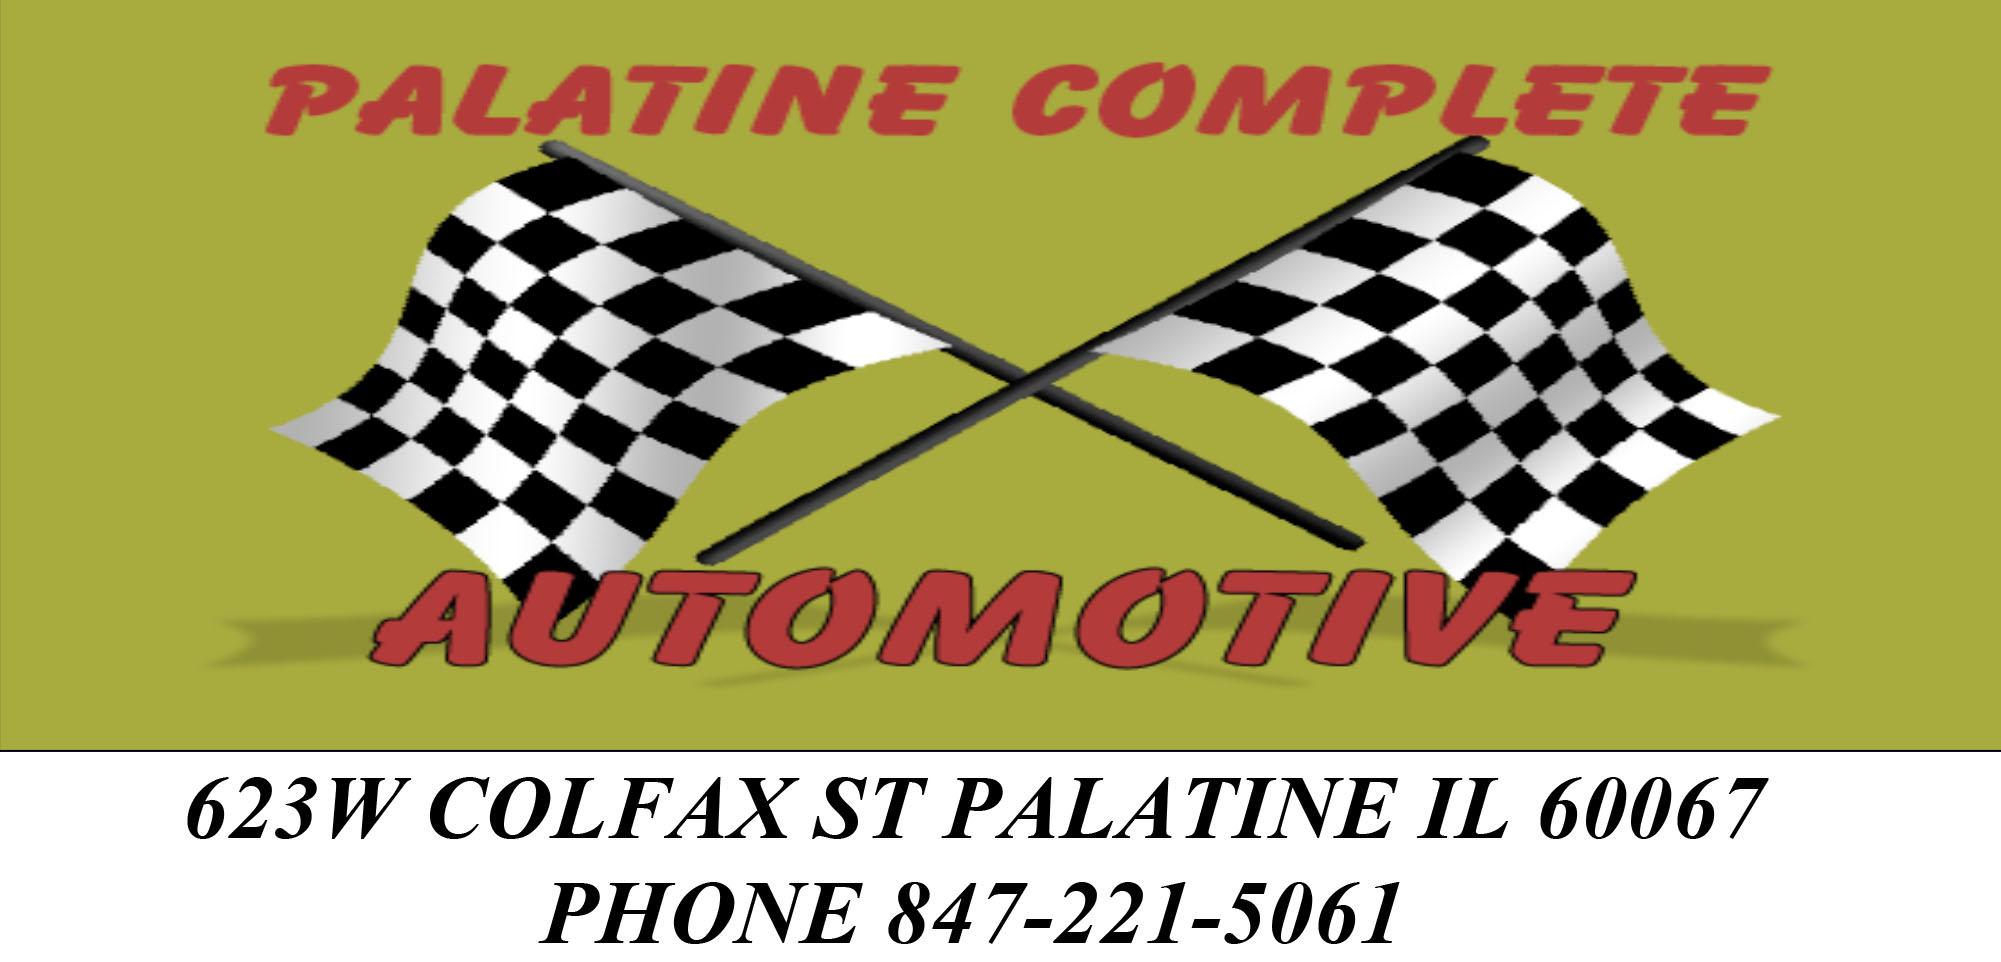 Palatine Complete Auto Repair